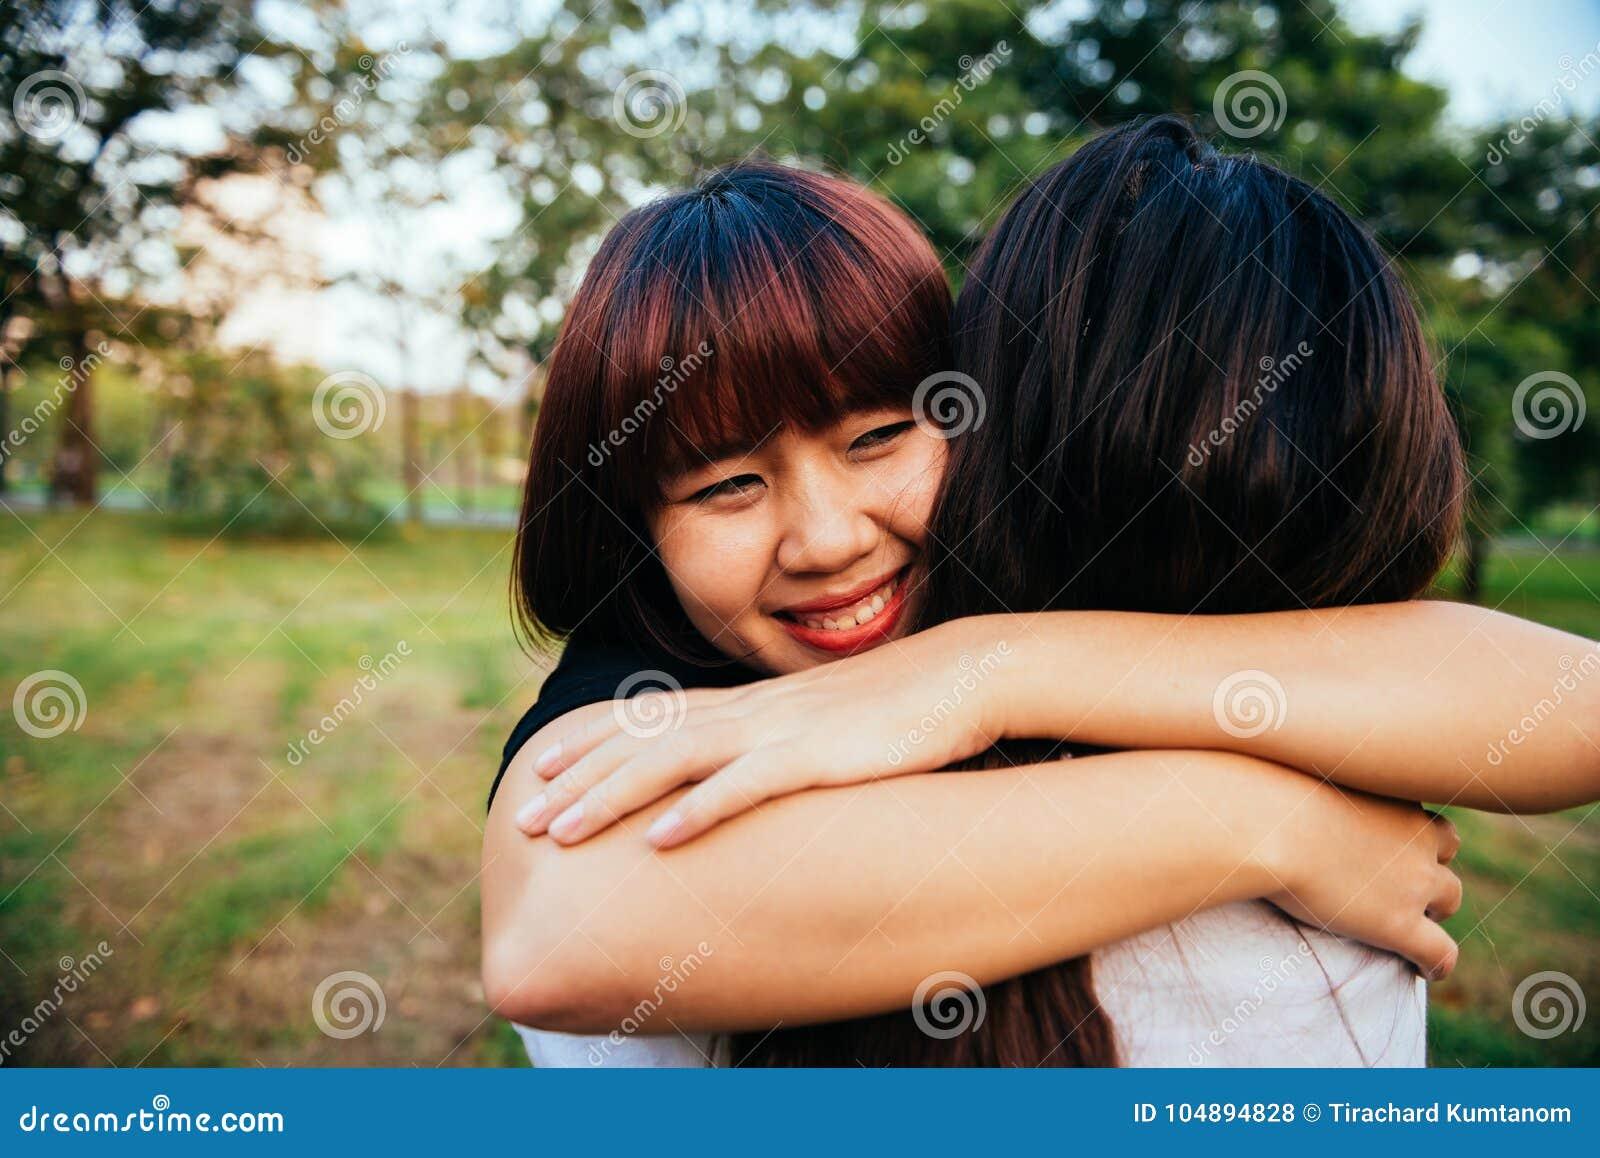 Women on women lesbian photos